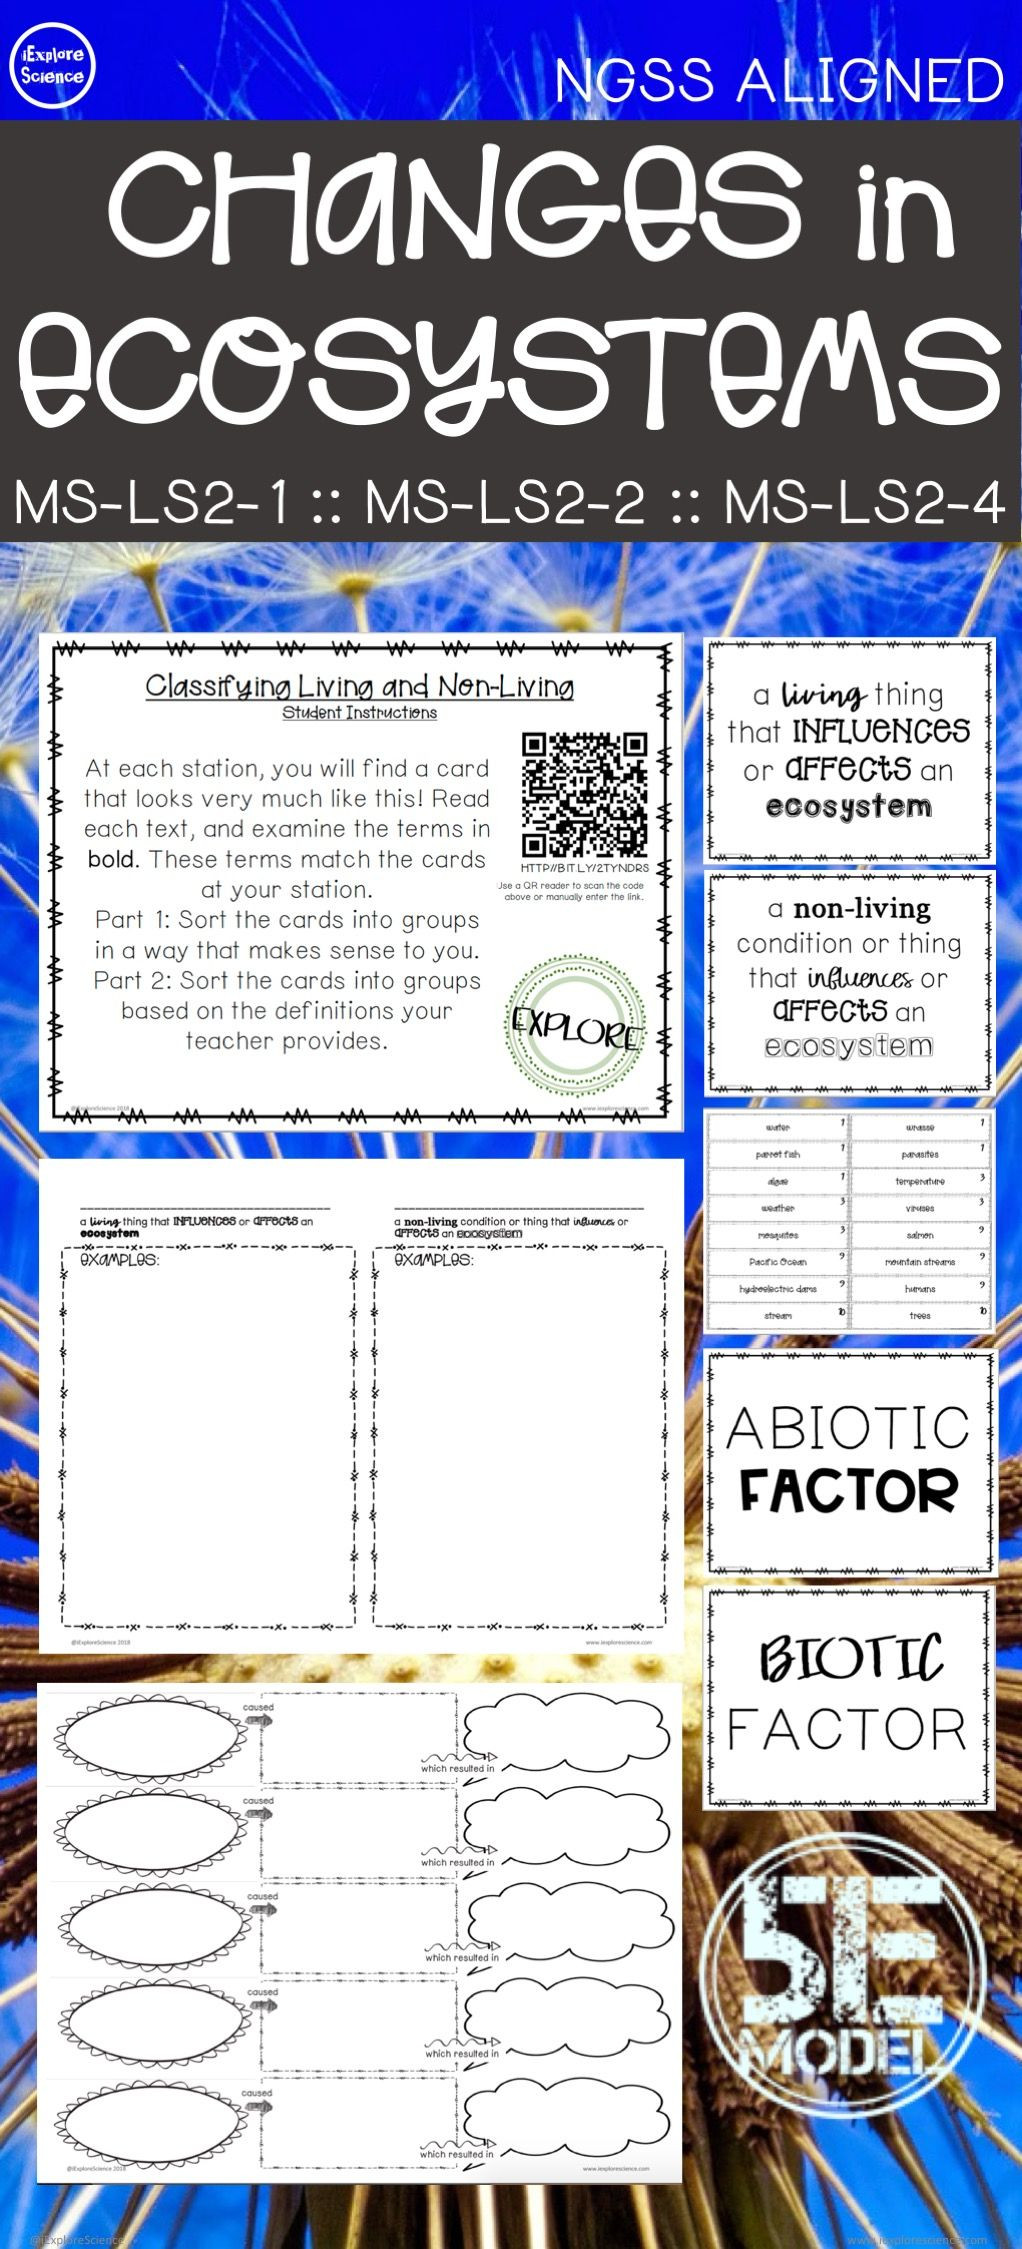 Abiotic and Biotic Factors Worksheet Biotic and Abiotic Factors 5e Activity Bundle Ngss Ms